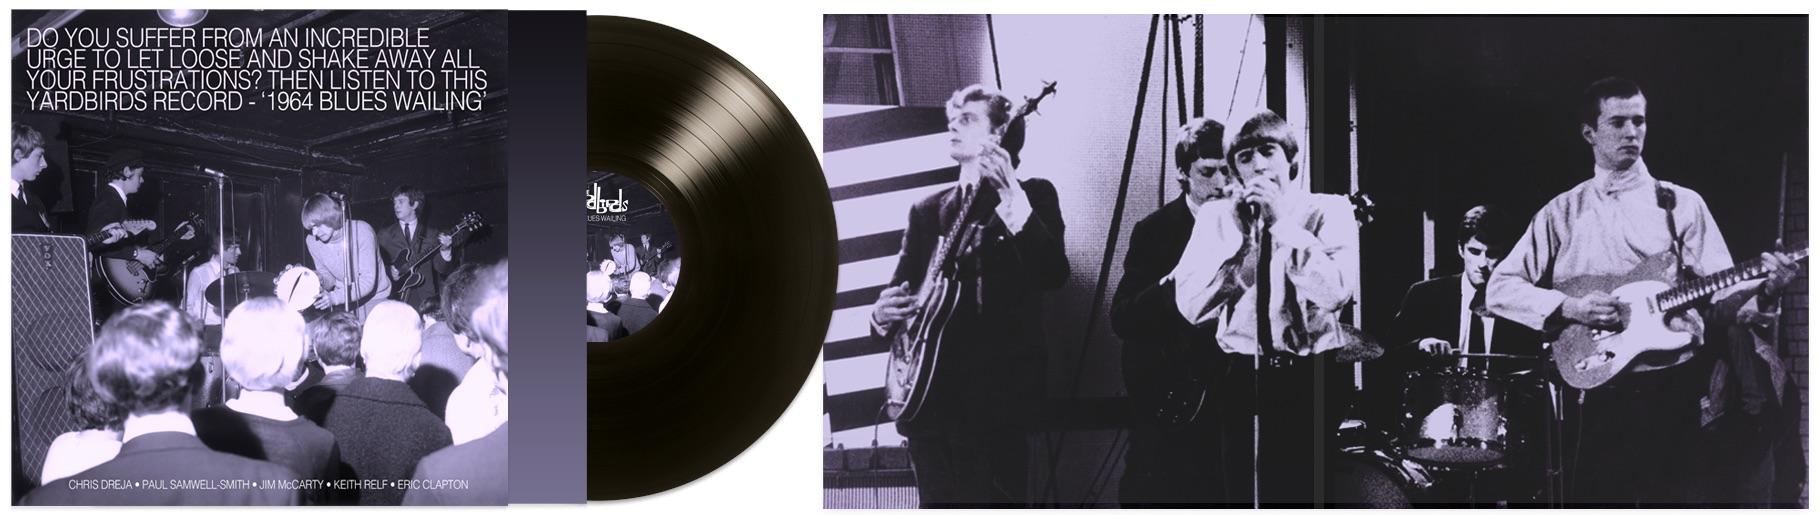 Blues Wailing - Five Live Yardbirds 1964